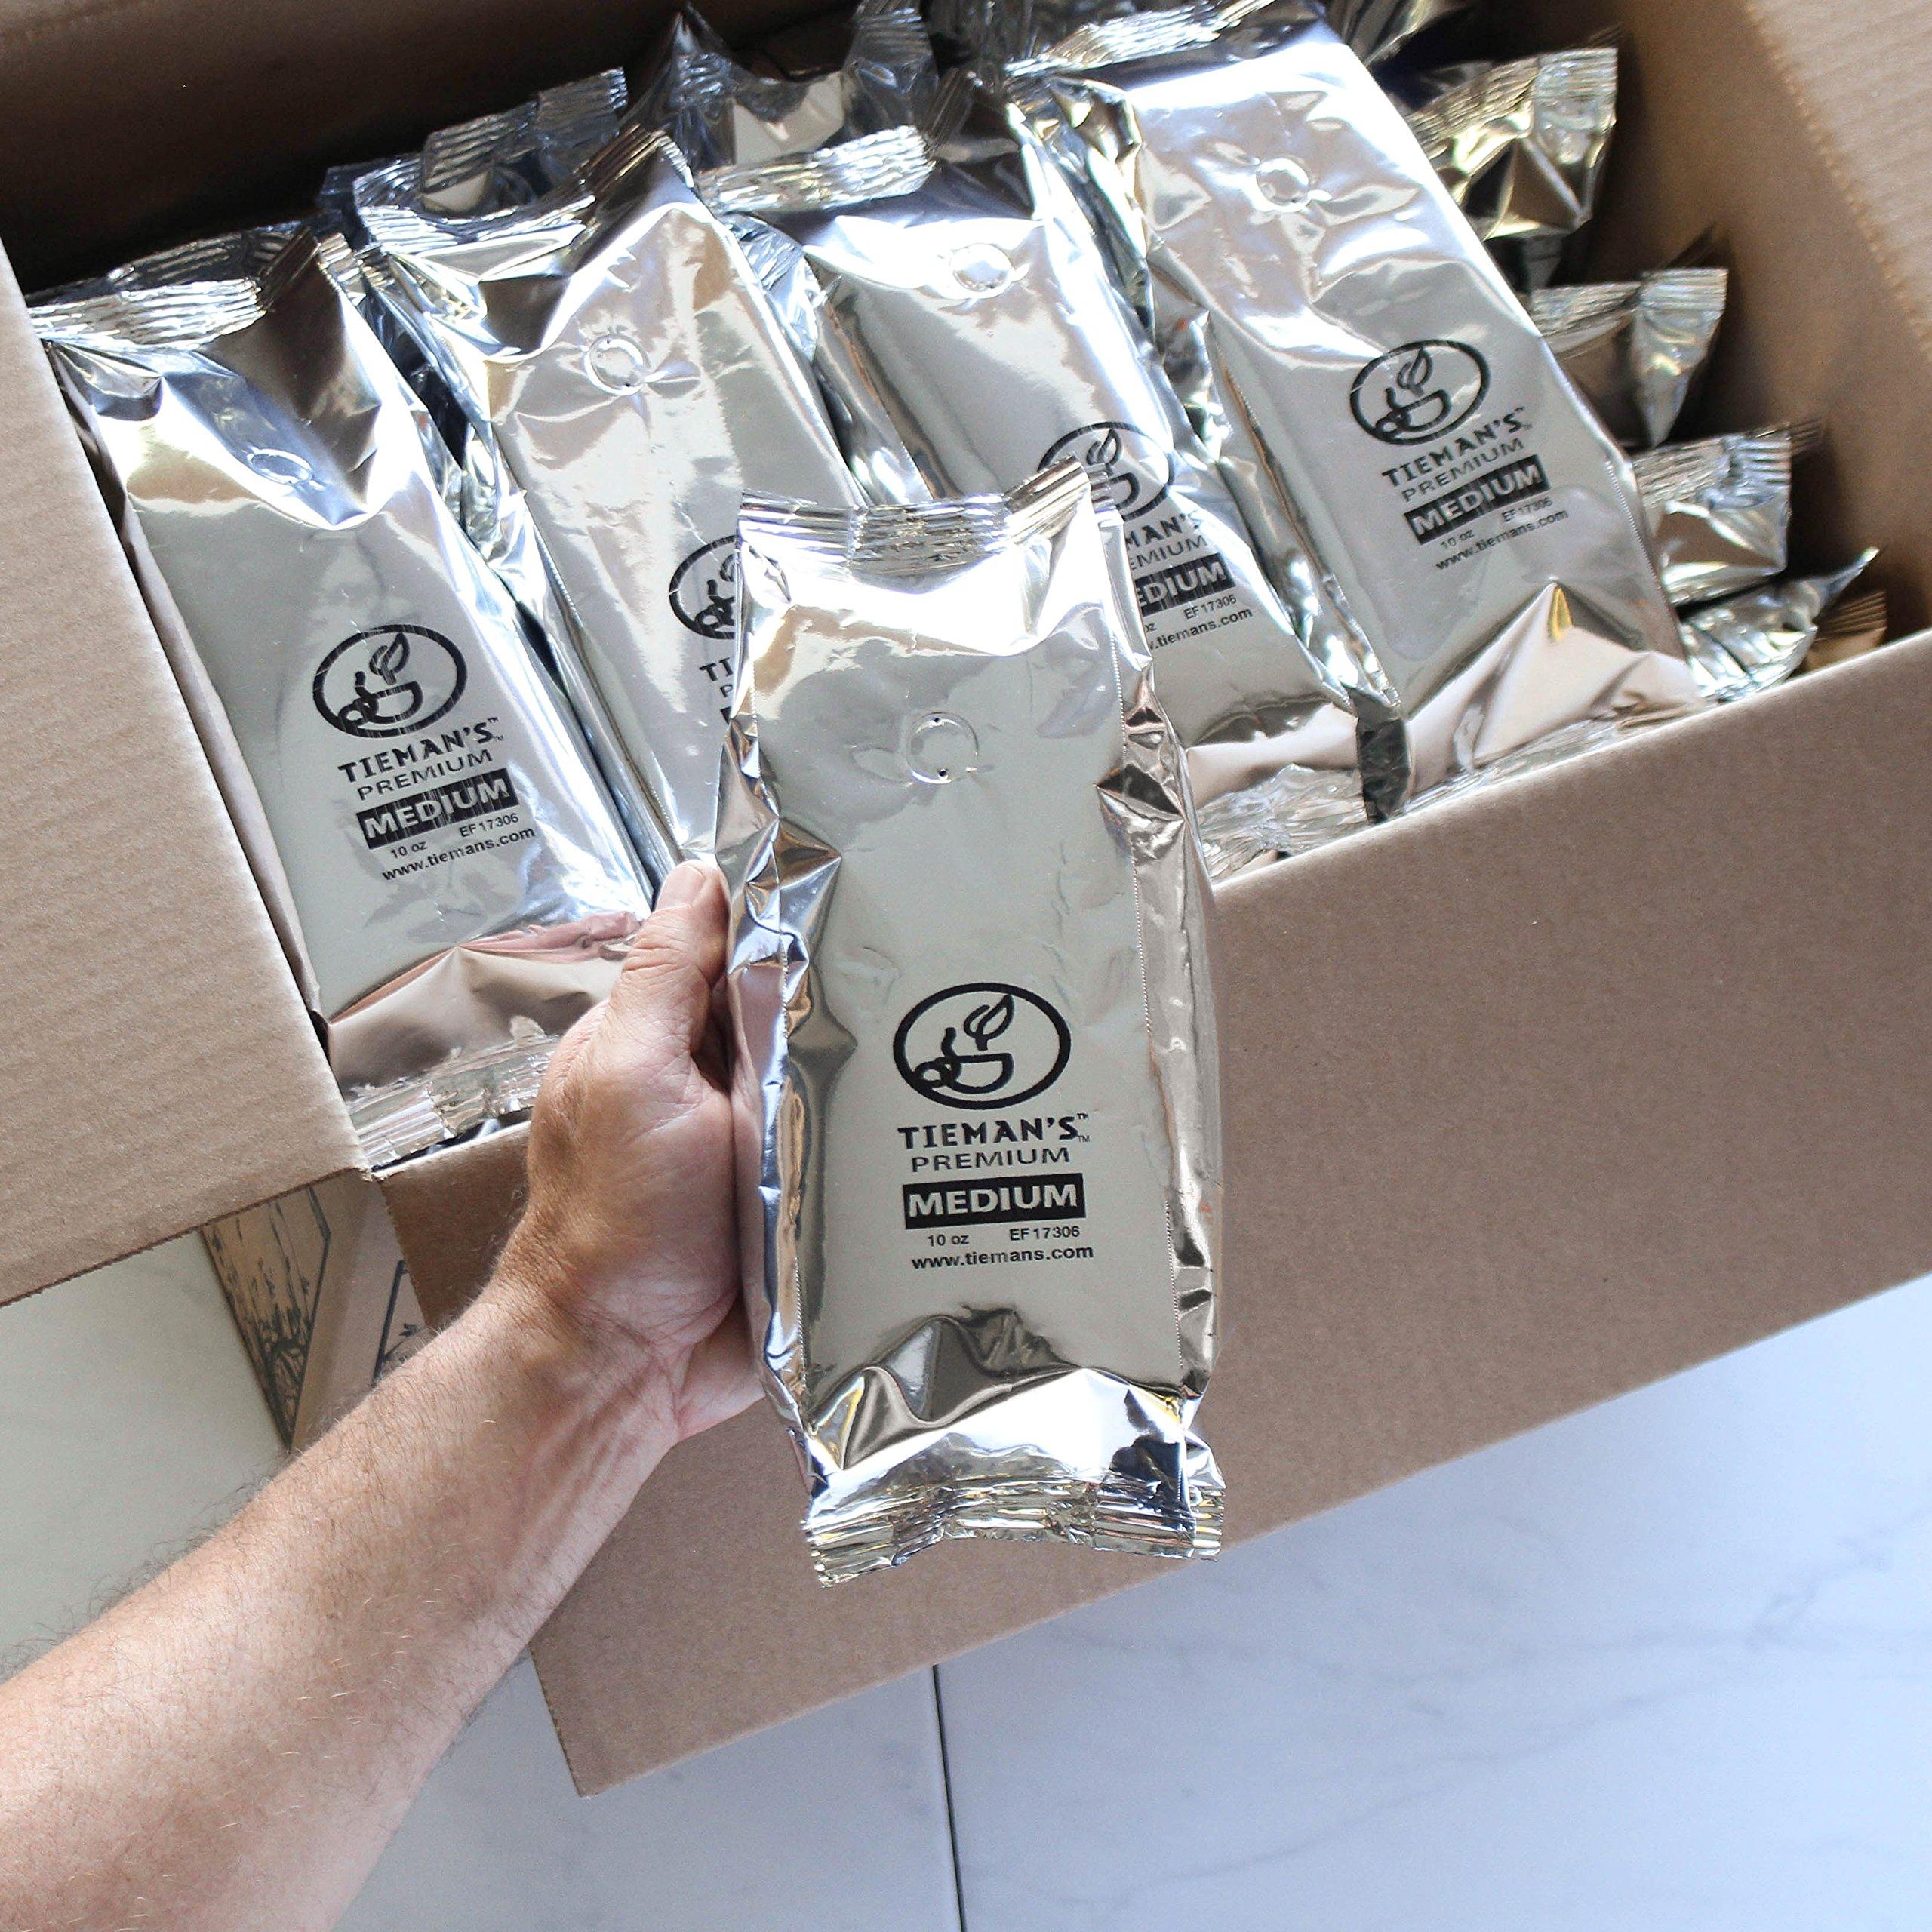 Tieman'S Fusion Coffee, Low Acid Medium Roast, Ground, 10-Ounce bag (30 Pack)